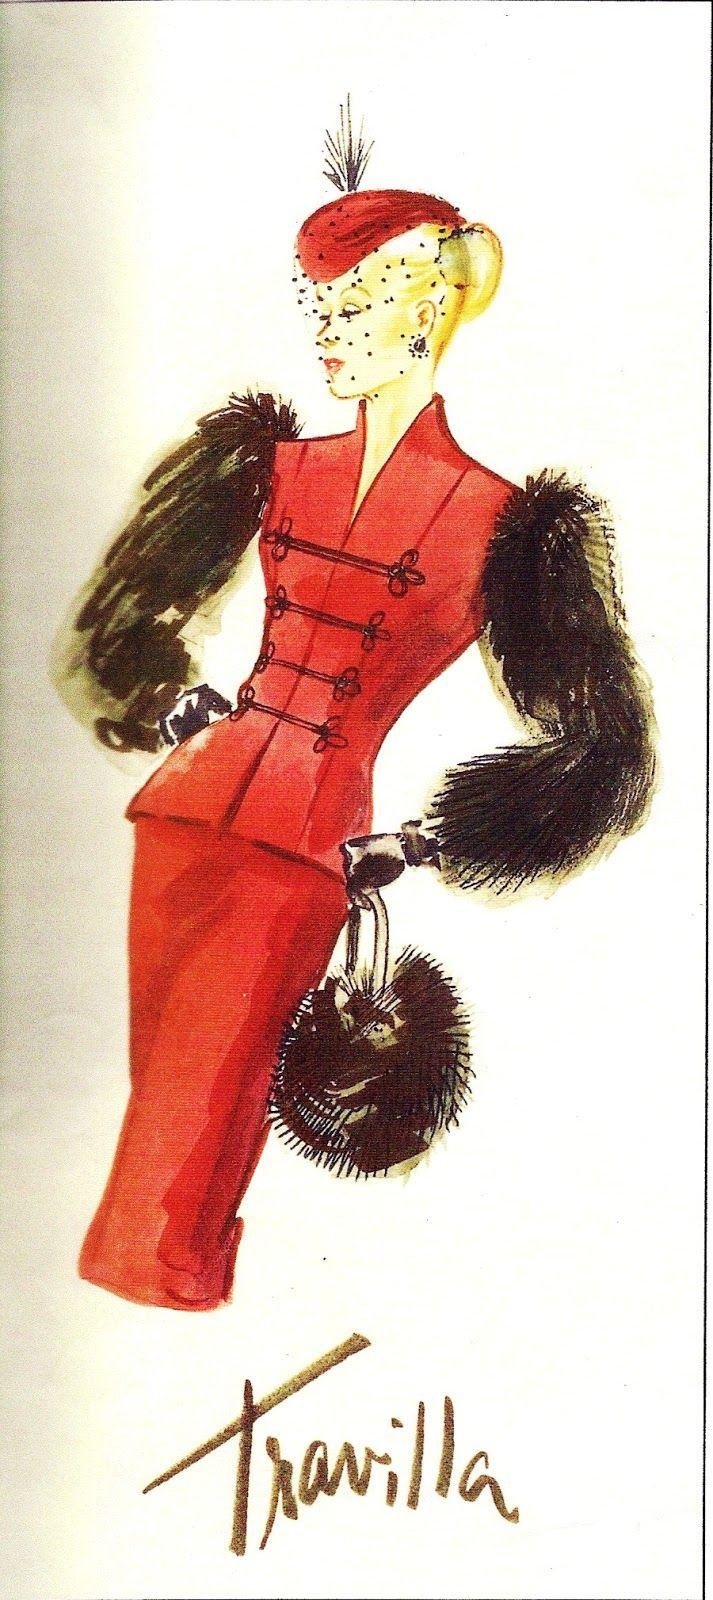 SEWING PATTERN-Style 116 Designer Inspired Suit Gene Tyler